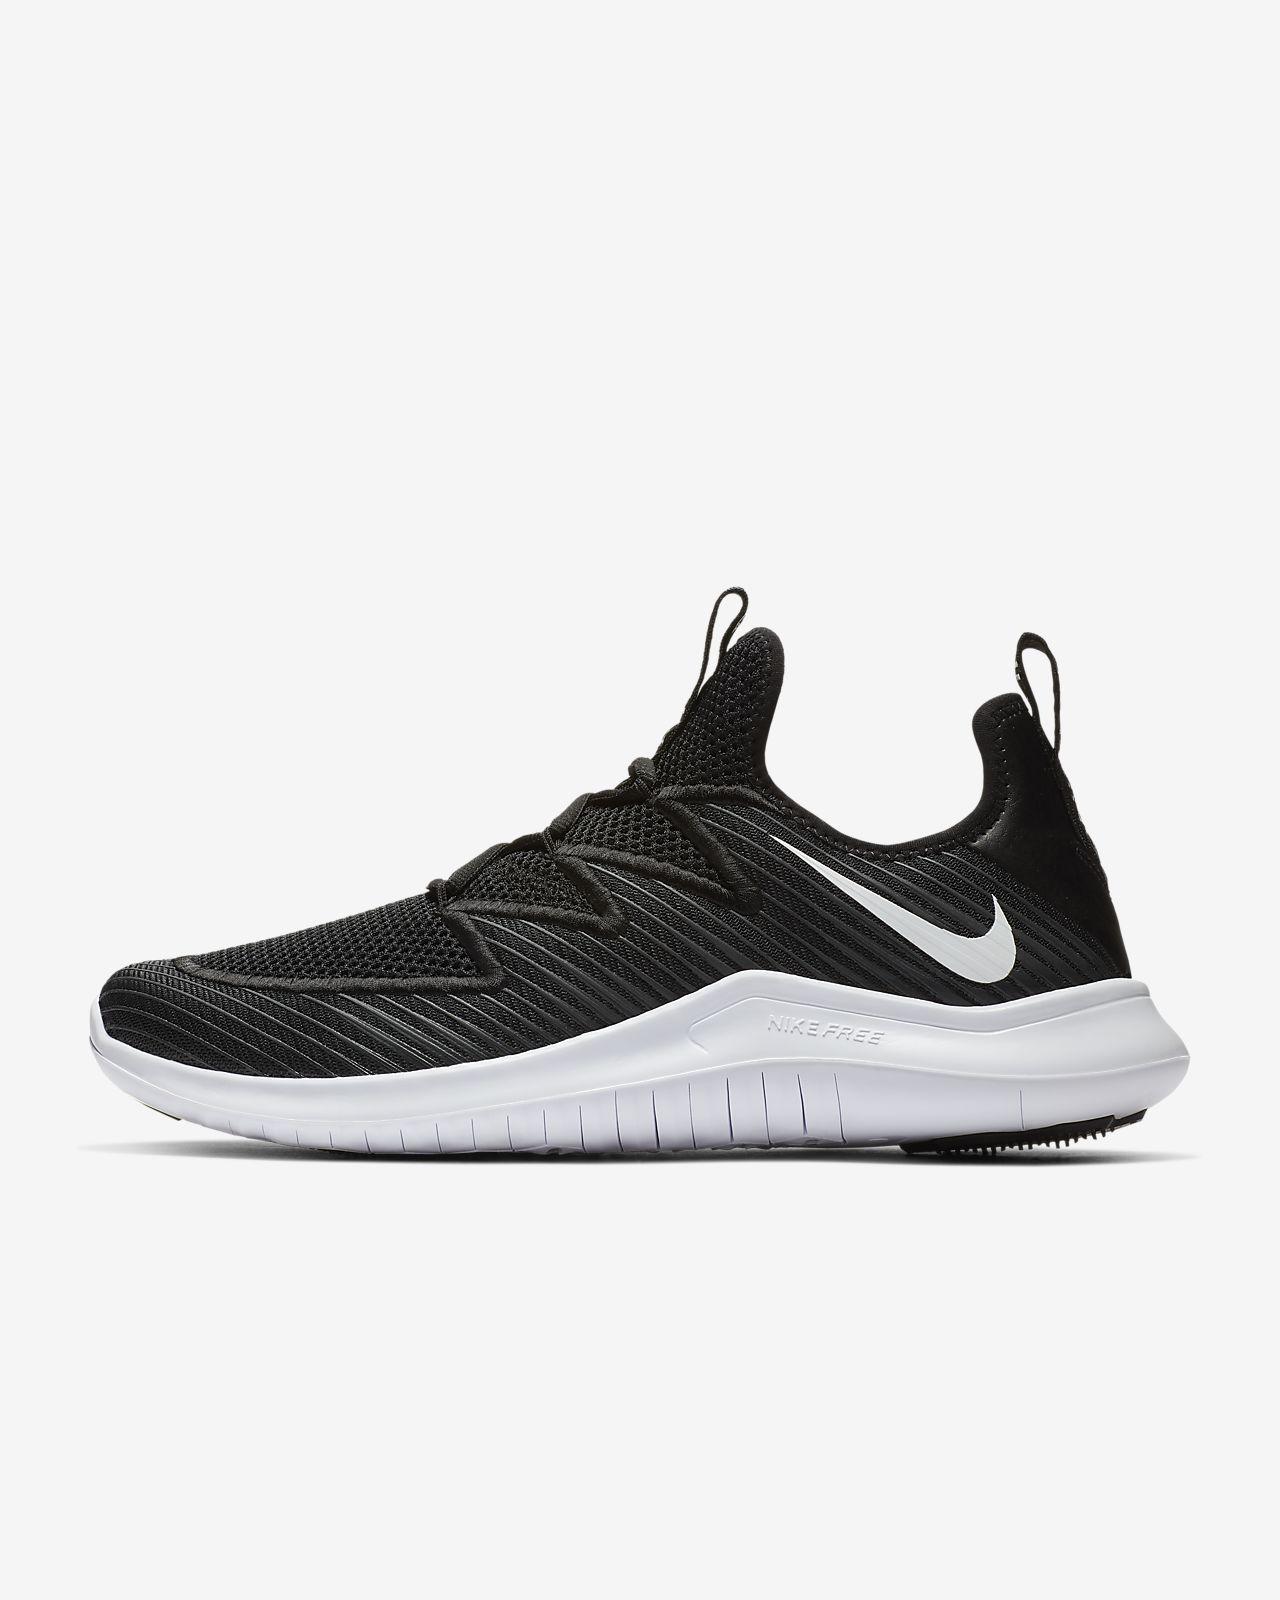 detailed look 51c1b 5af47 ... Nike Free TR 9 Ultra Herren-Trainingsschuh